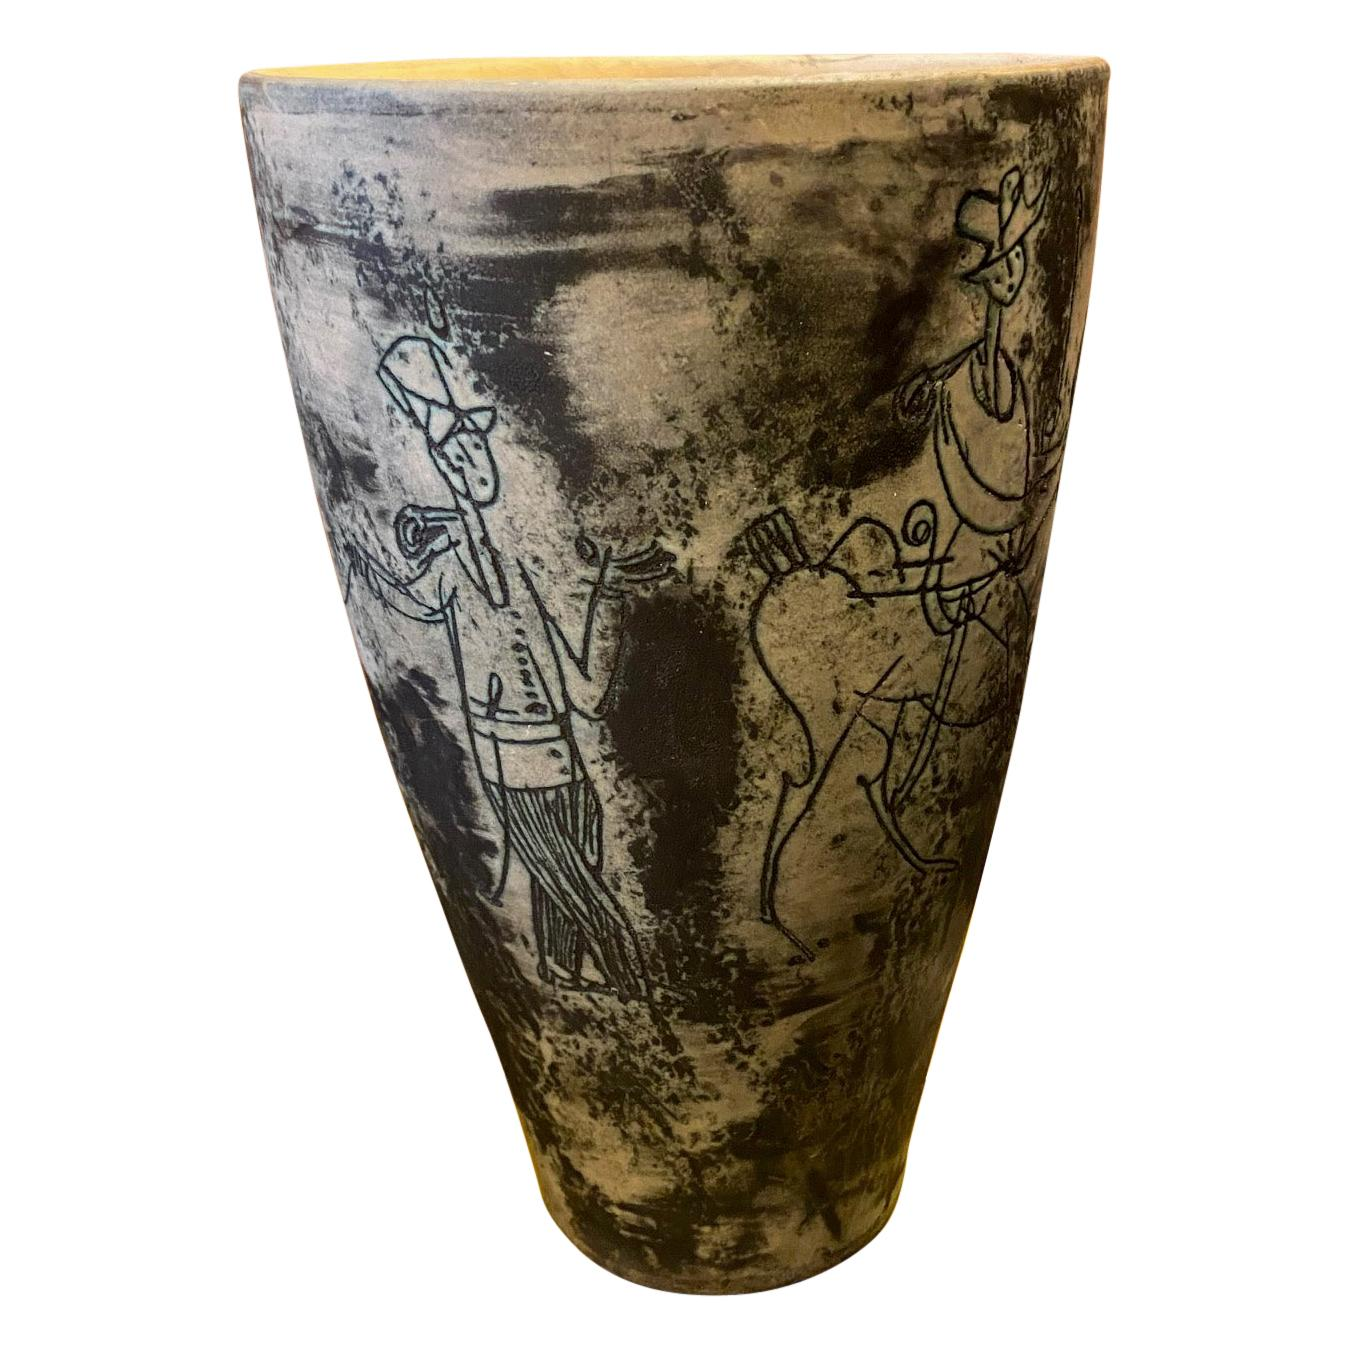 Ceramic Vase by Jacques Blin, France, 1960s